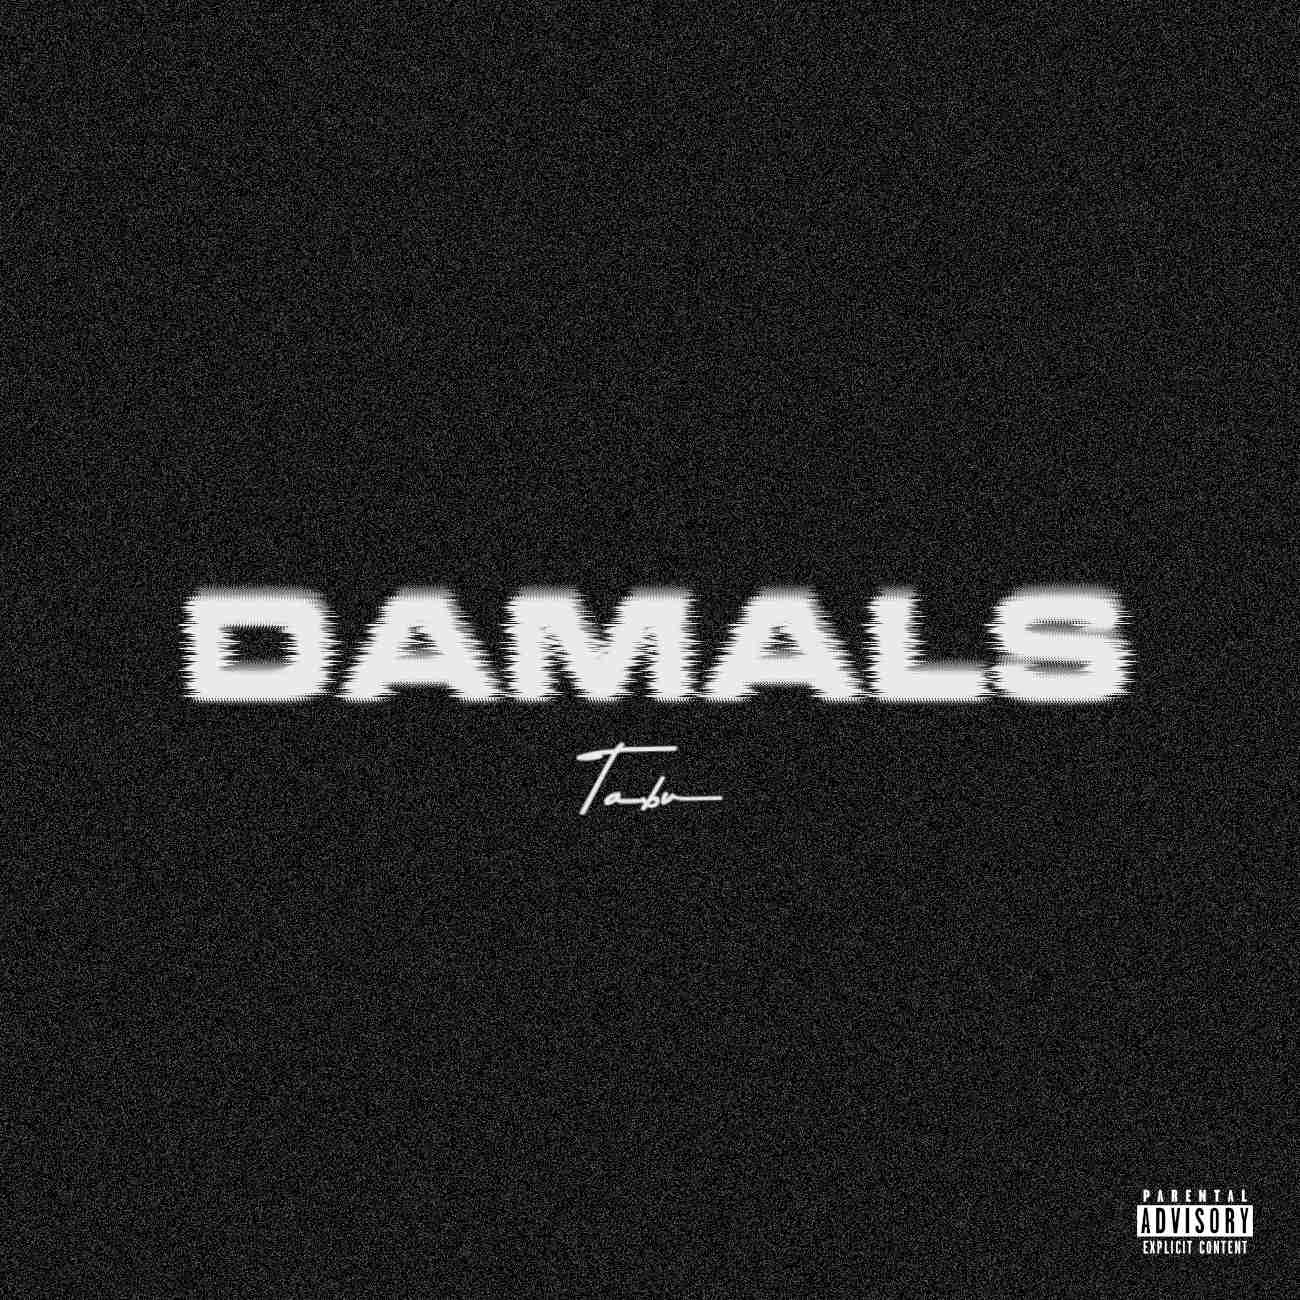 Upcoming: Tabu - Damals